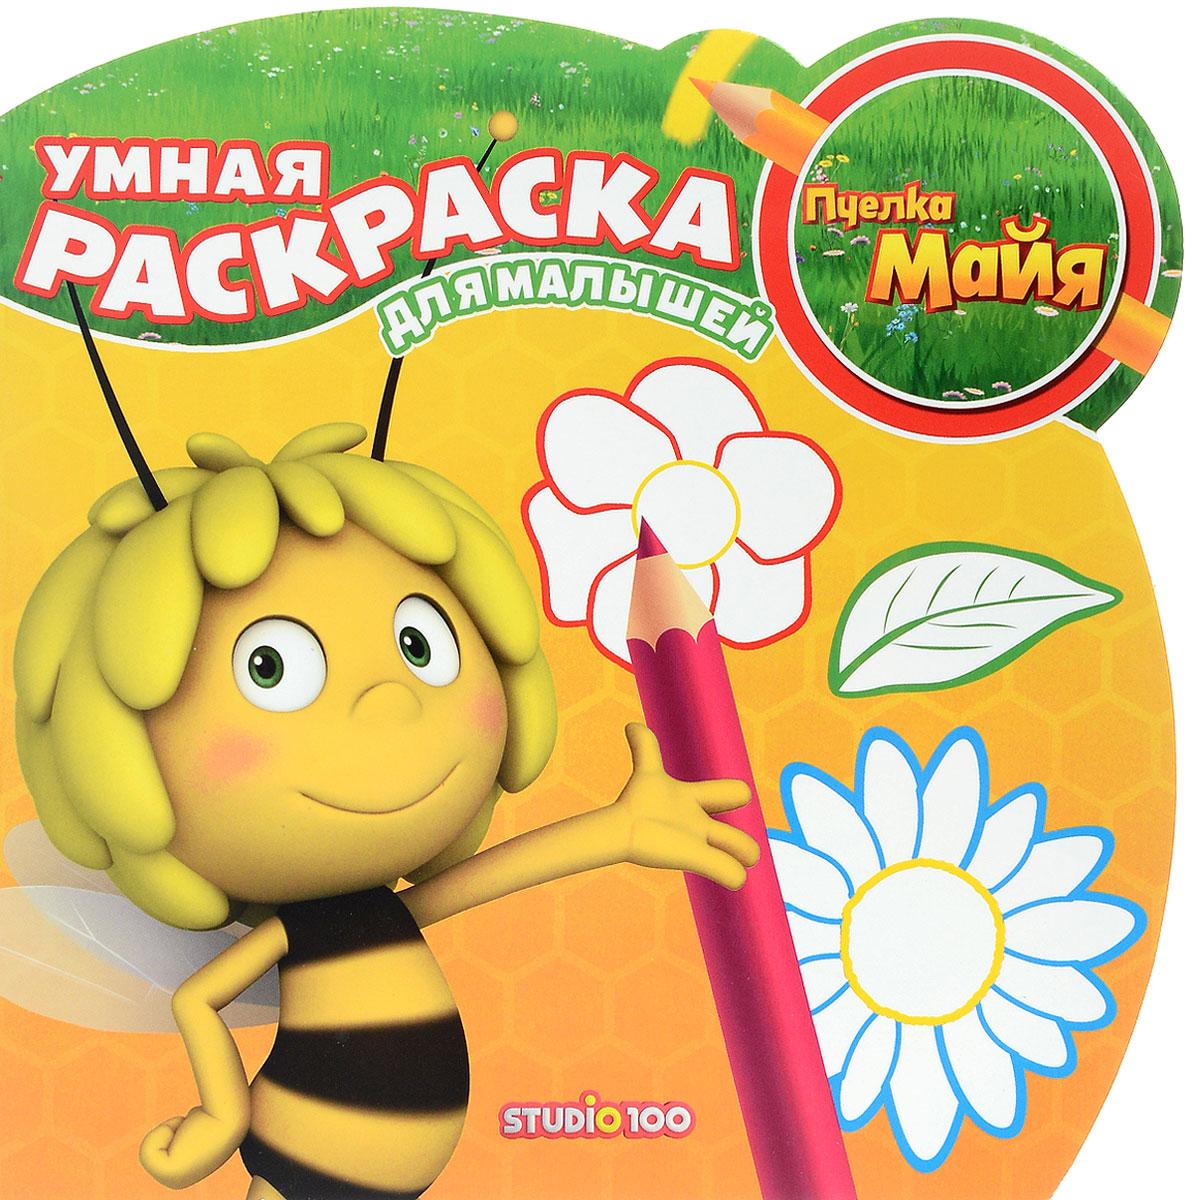 Пчелка Майя. Раскраска